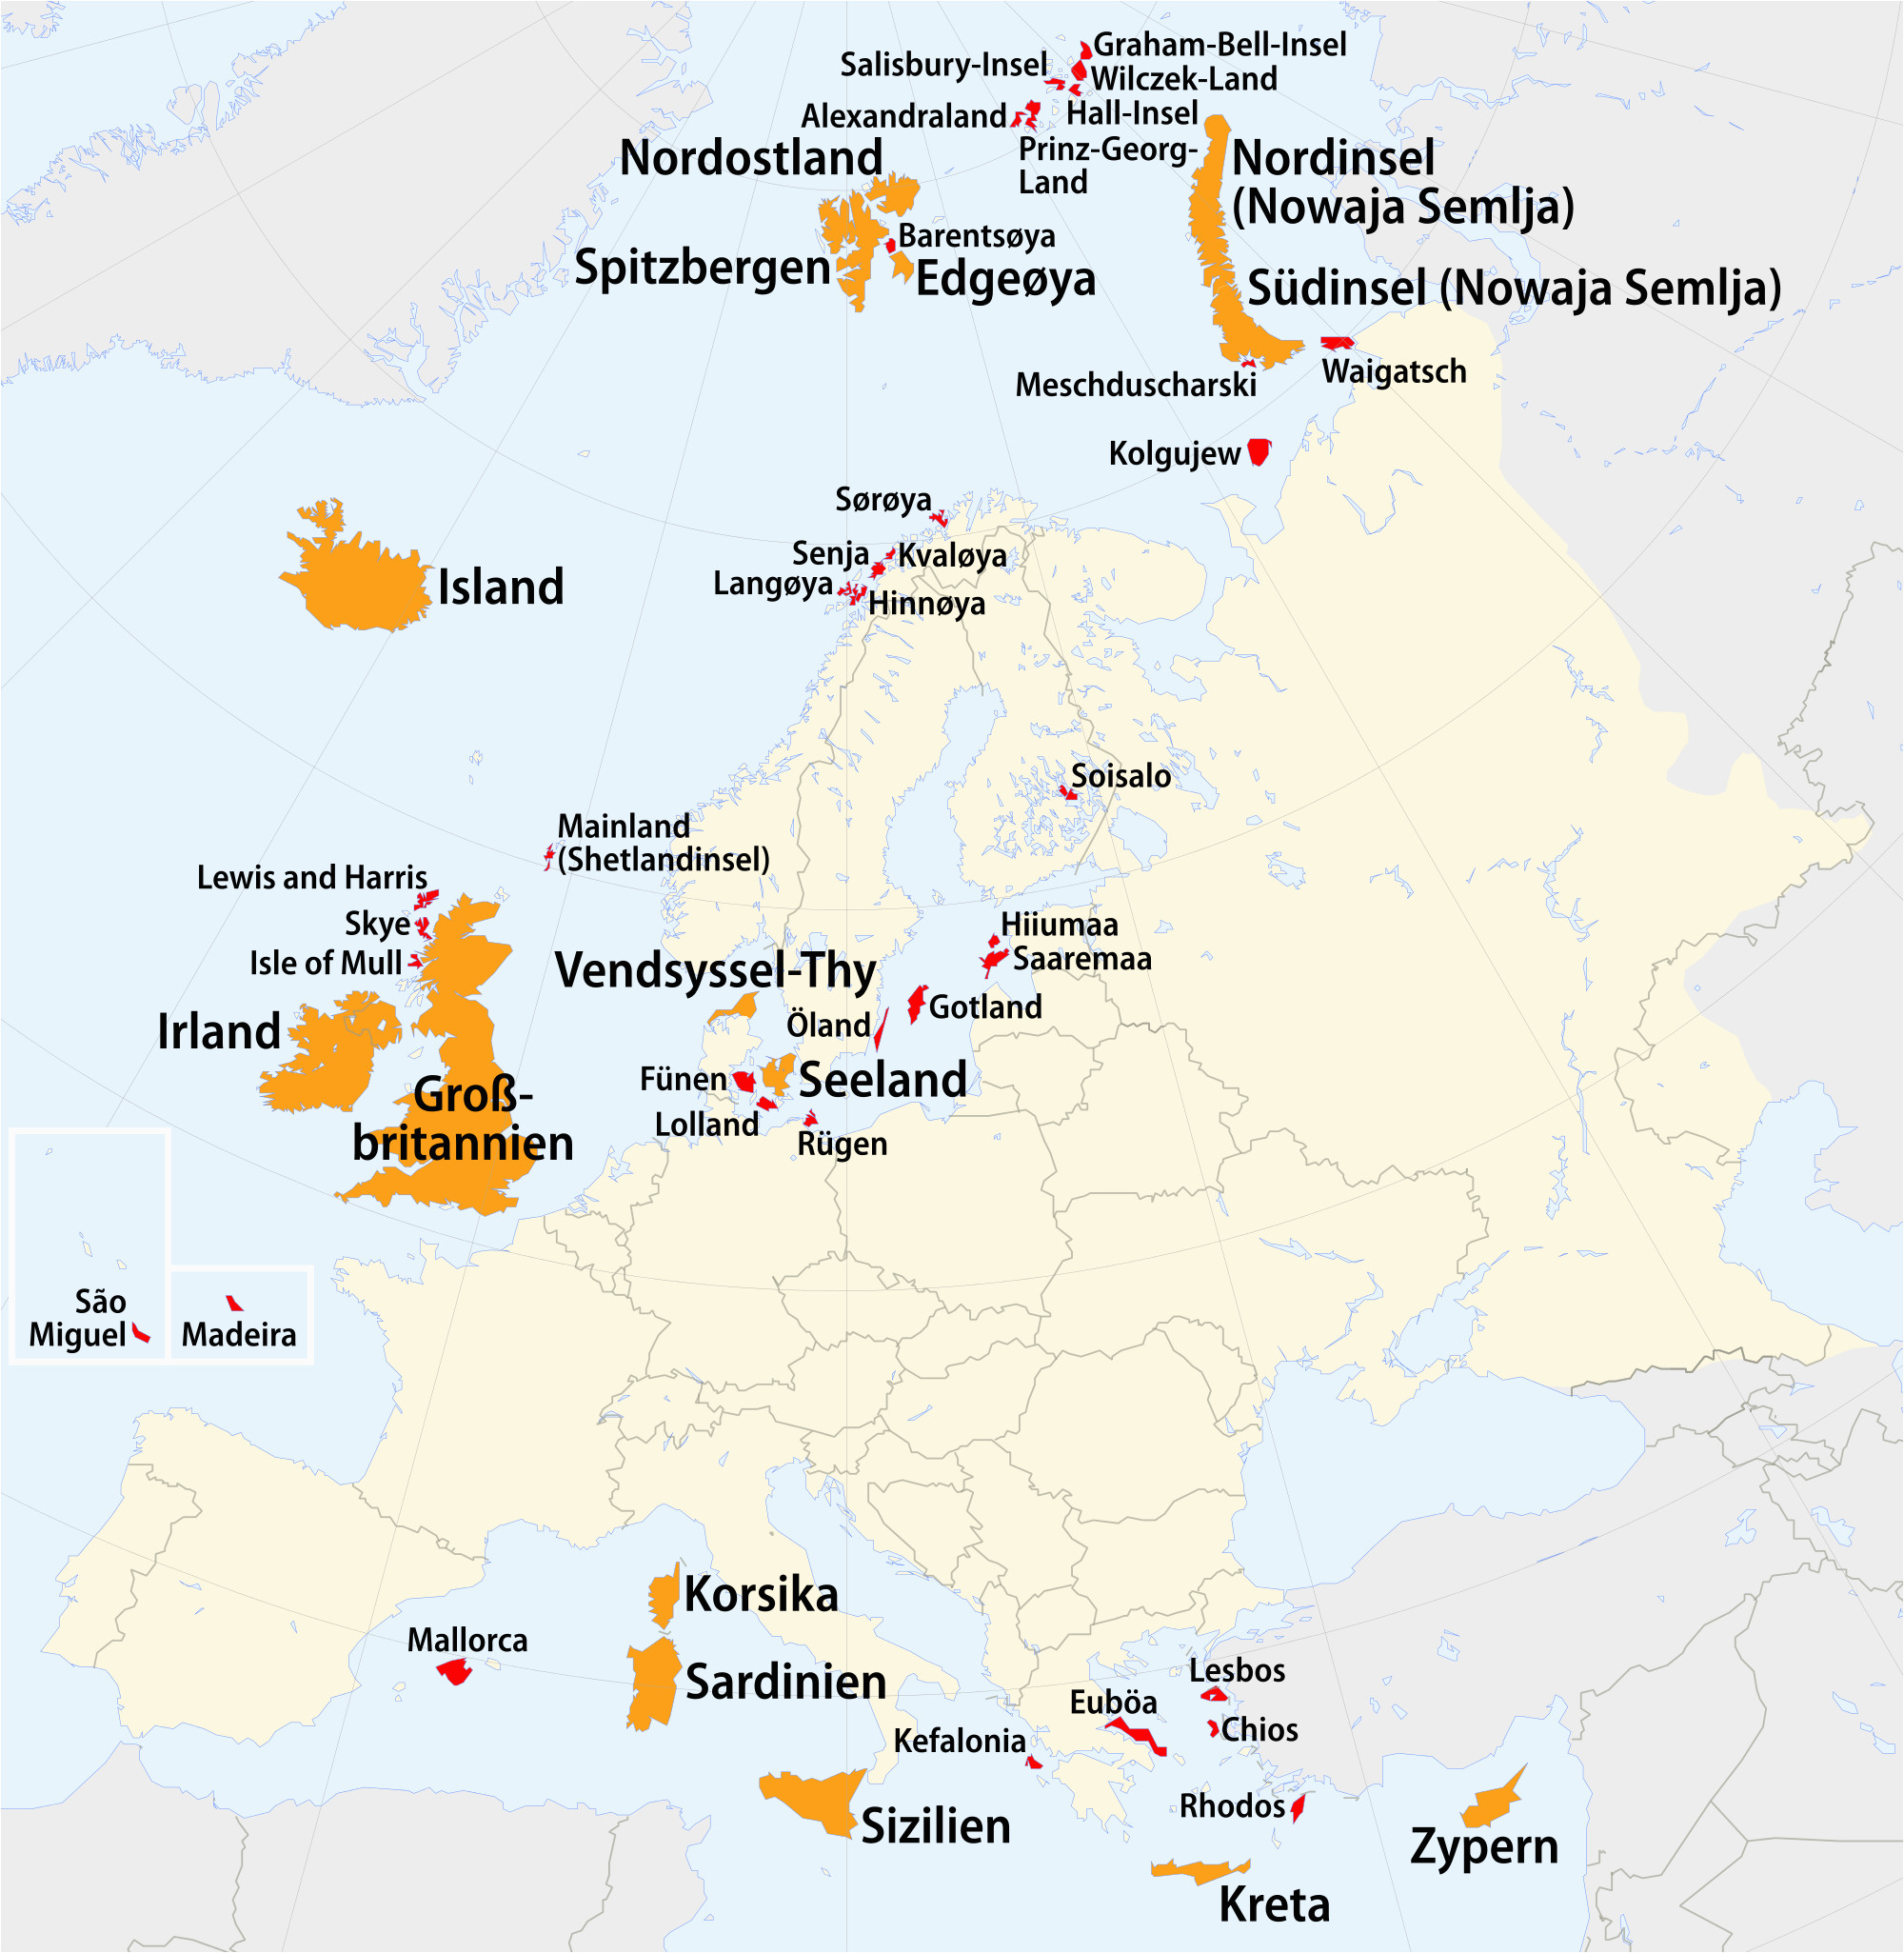 liste europaischer inseln nach flache wikipedia